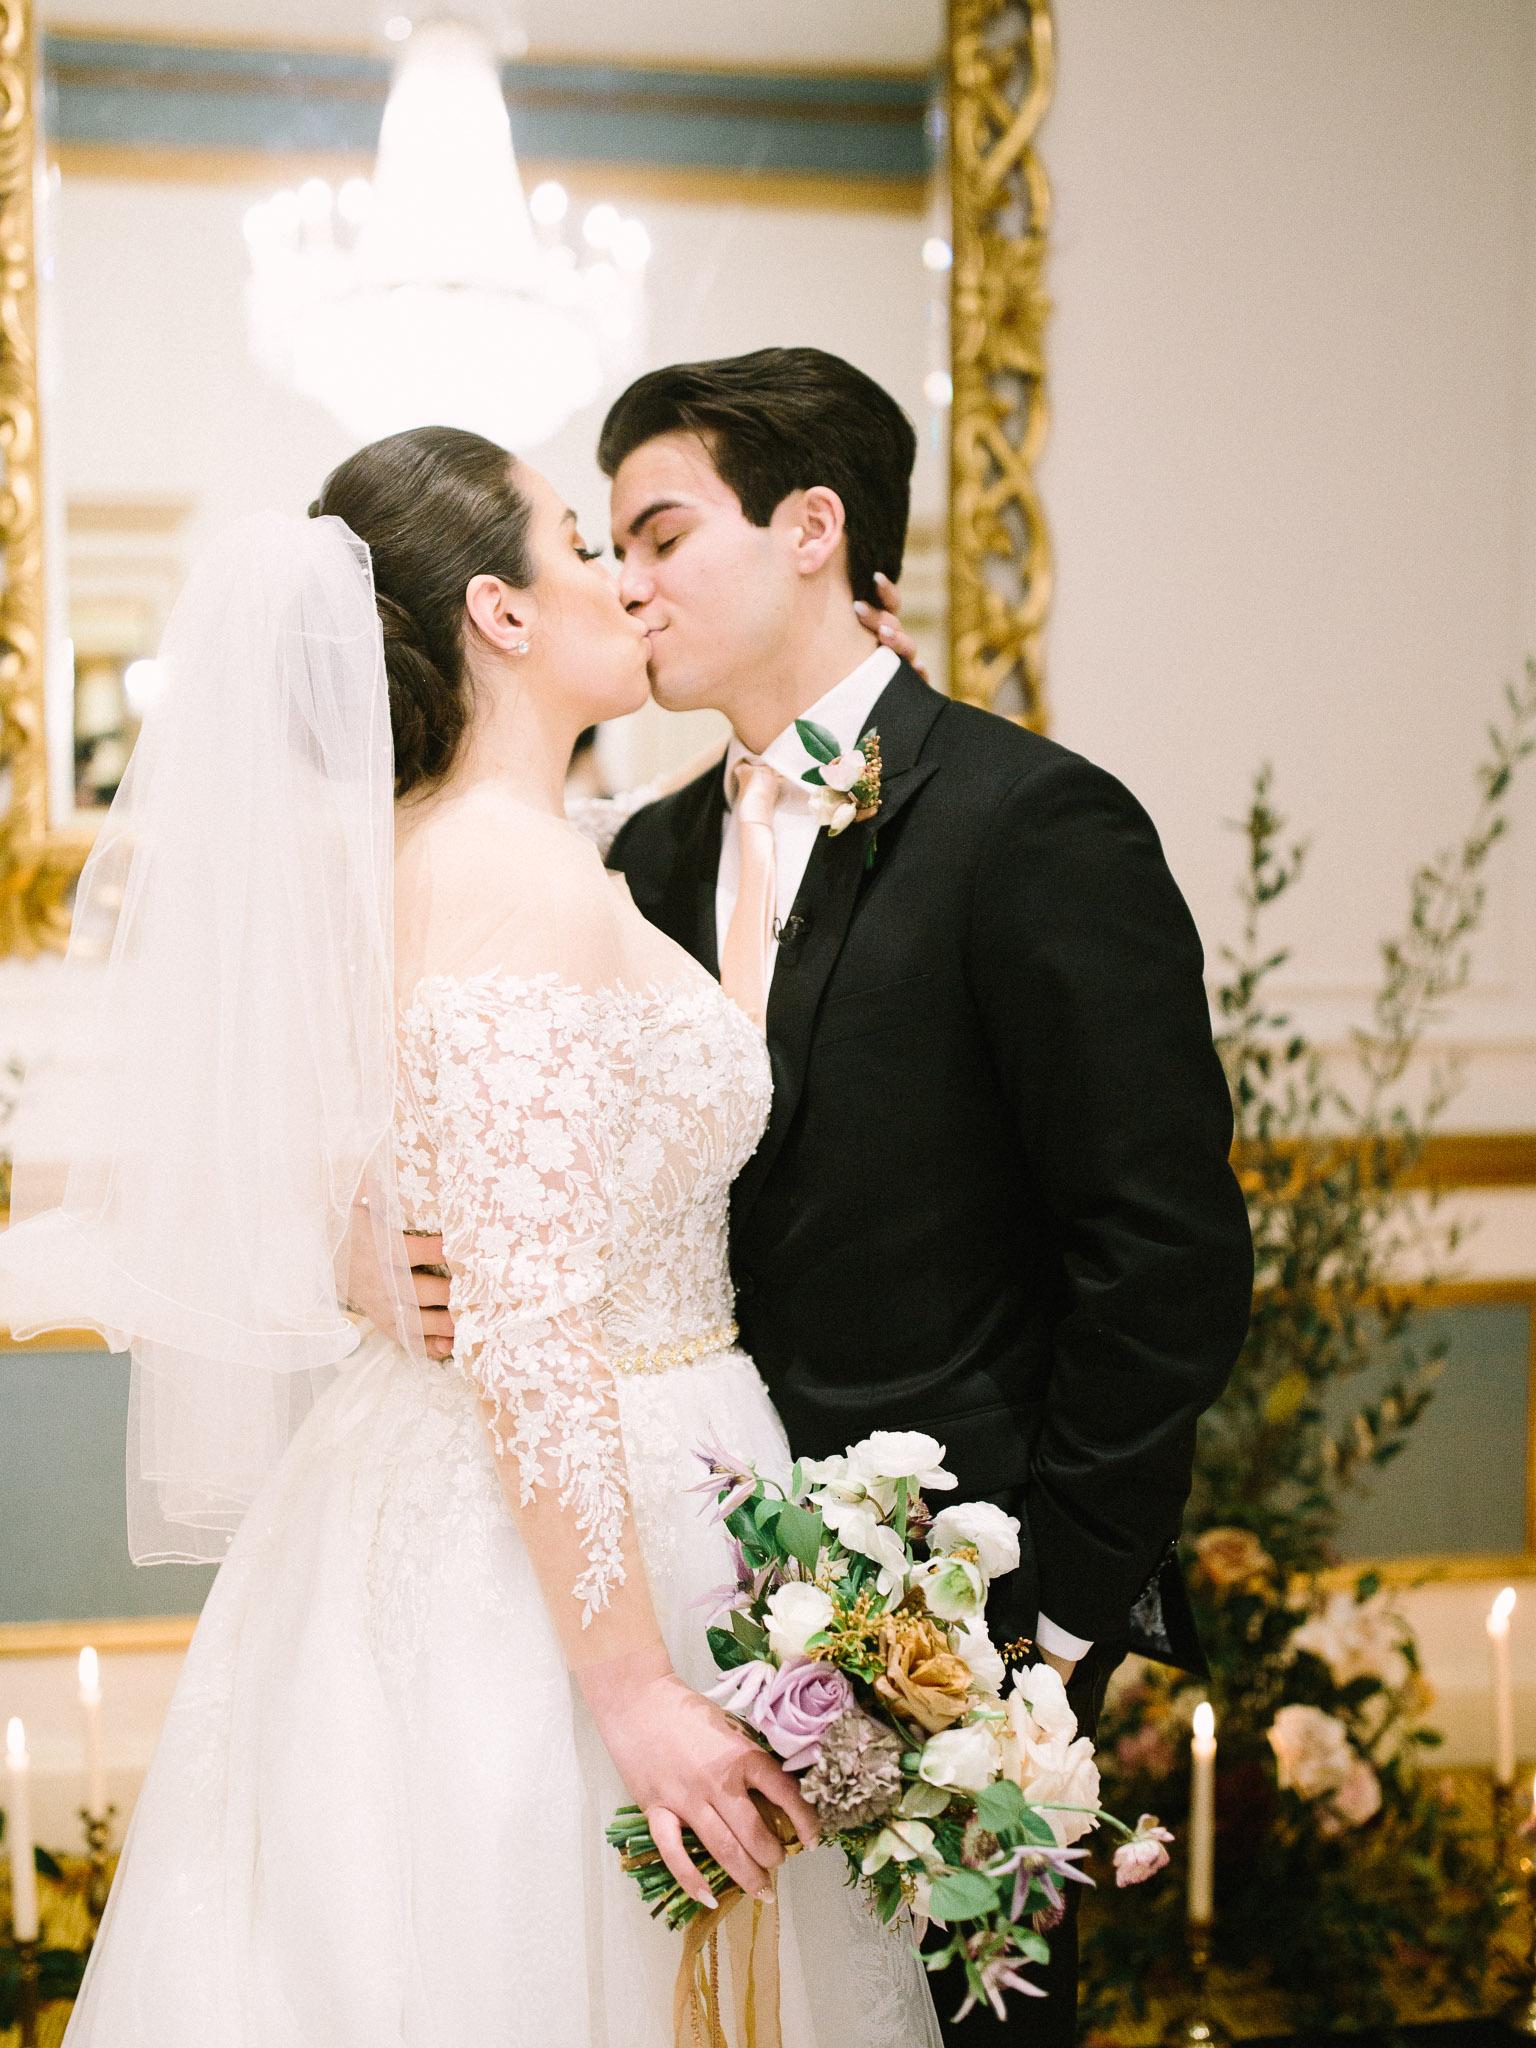 Hanna&Jordan Wedding_HotelVancouver_9388.jpg